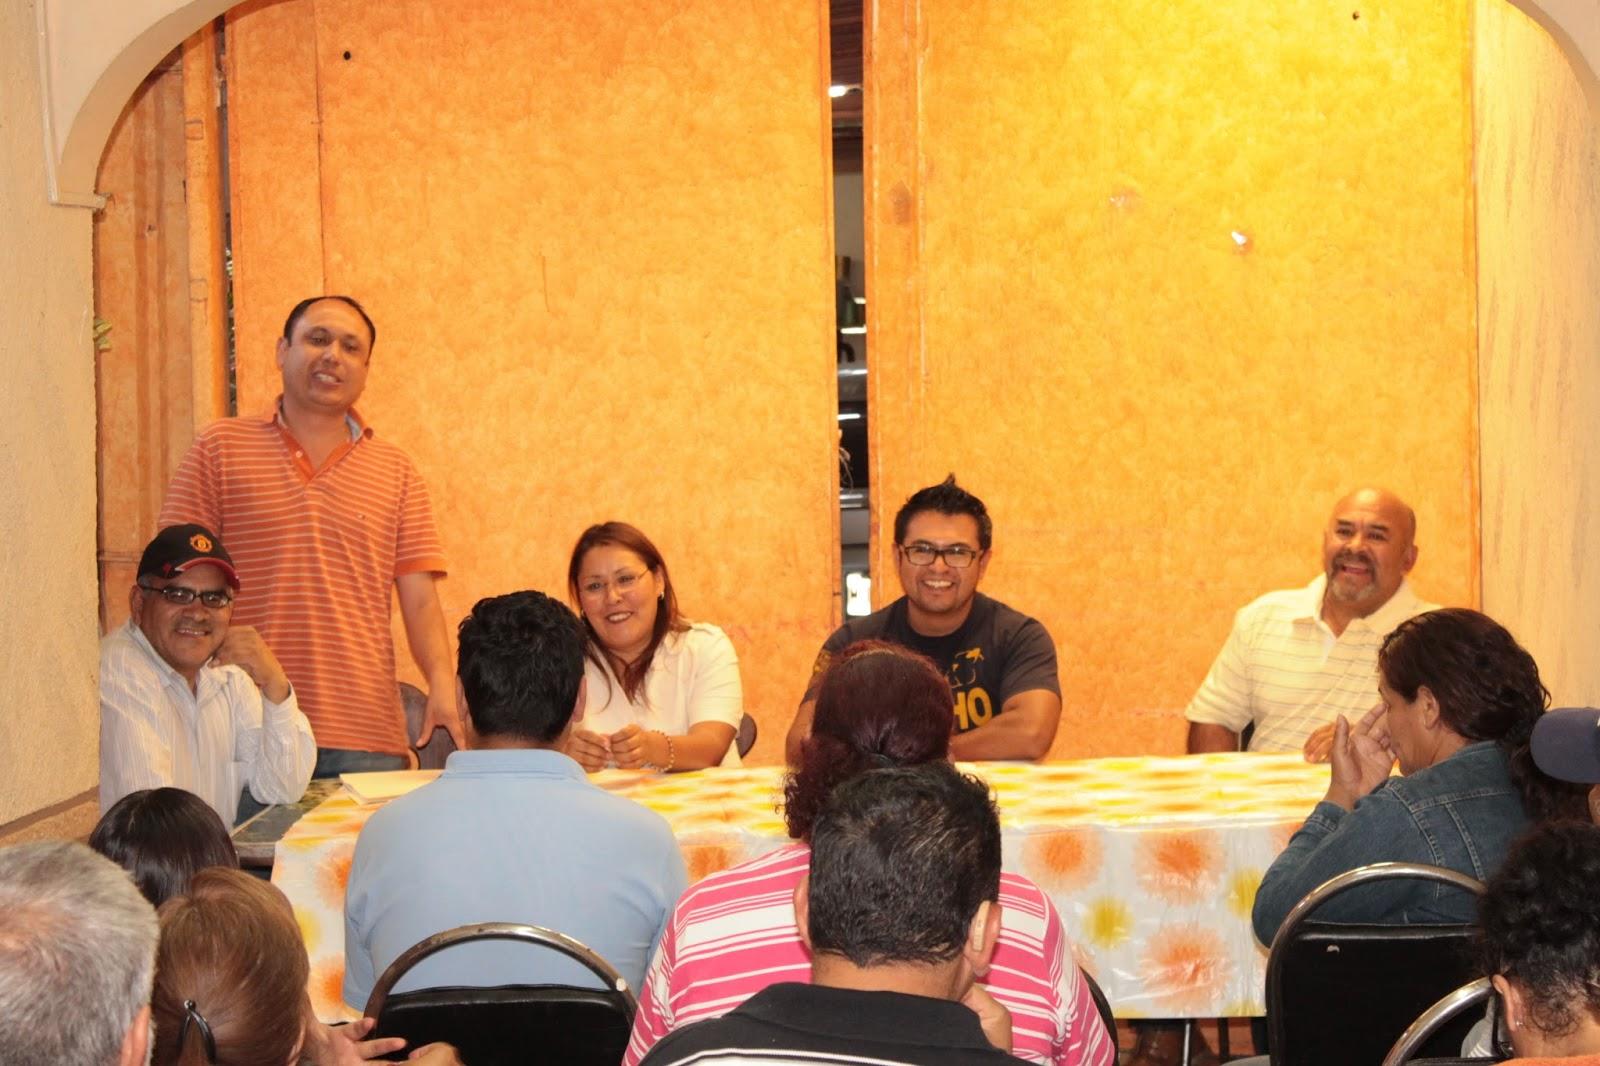 Planilla 7 ecatepec vecinos de jardines del tepeyac for Jardin 7 hermanos ecatepec